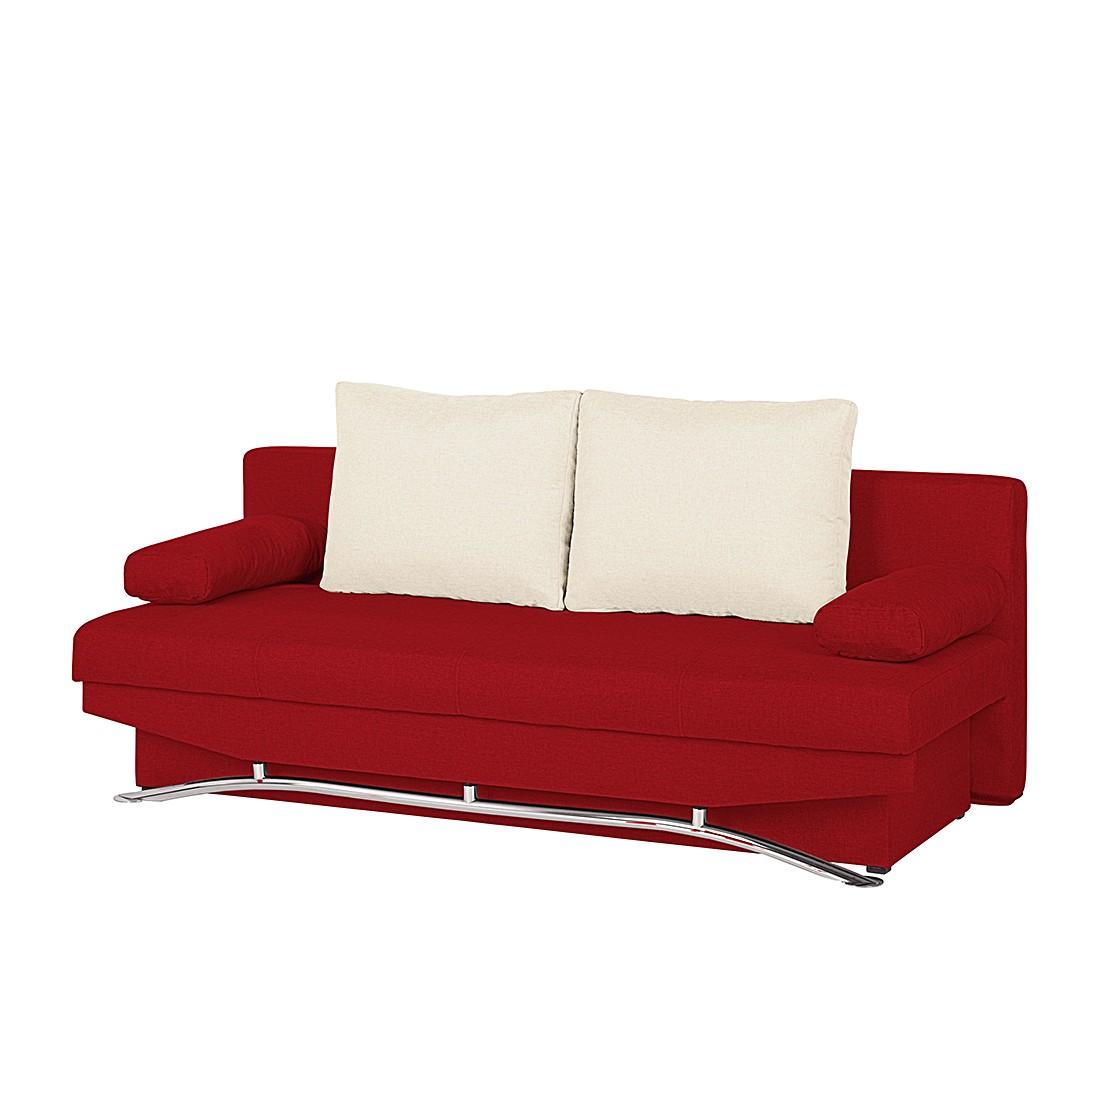 Schlafsofa Lenni – Webstoff Rot, mooved günstig